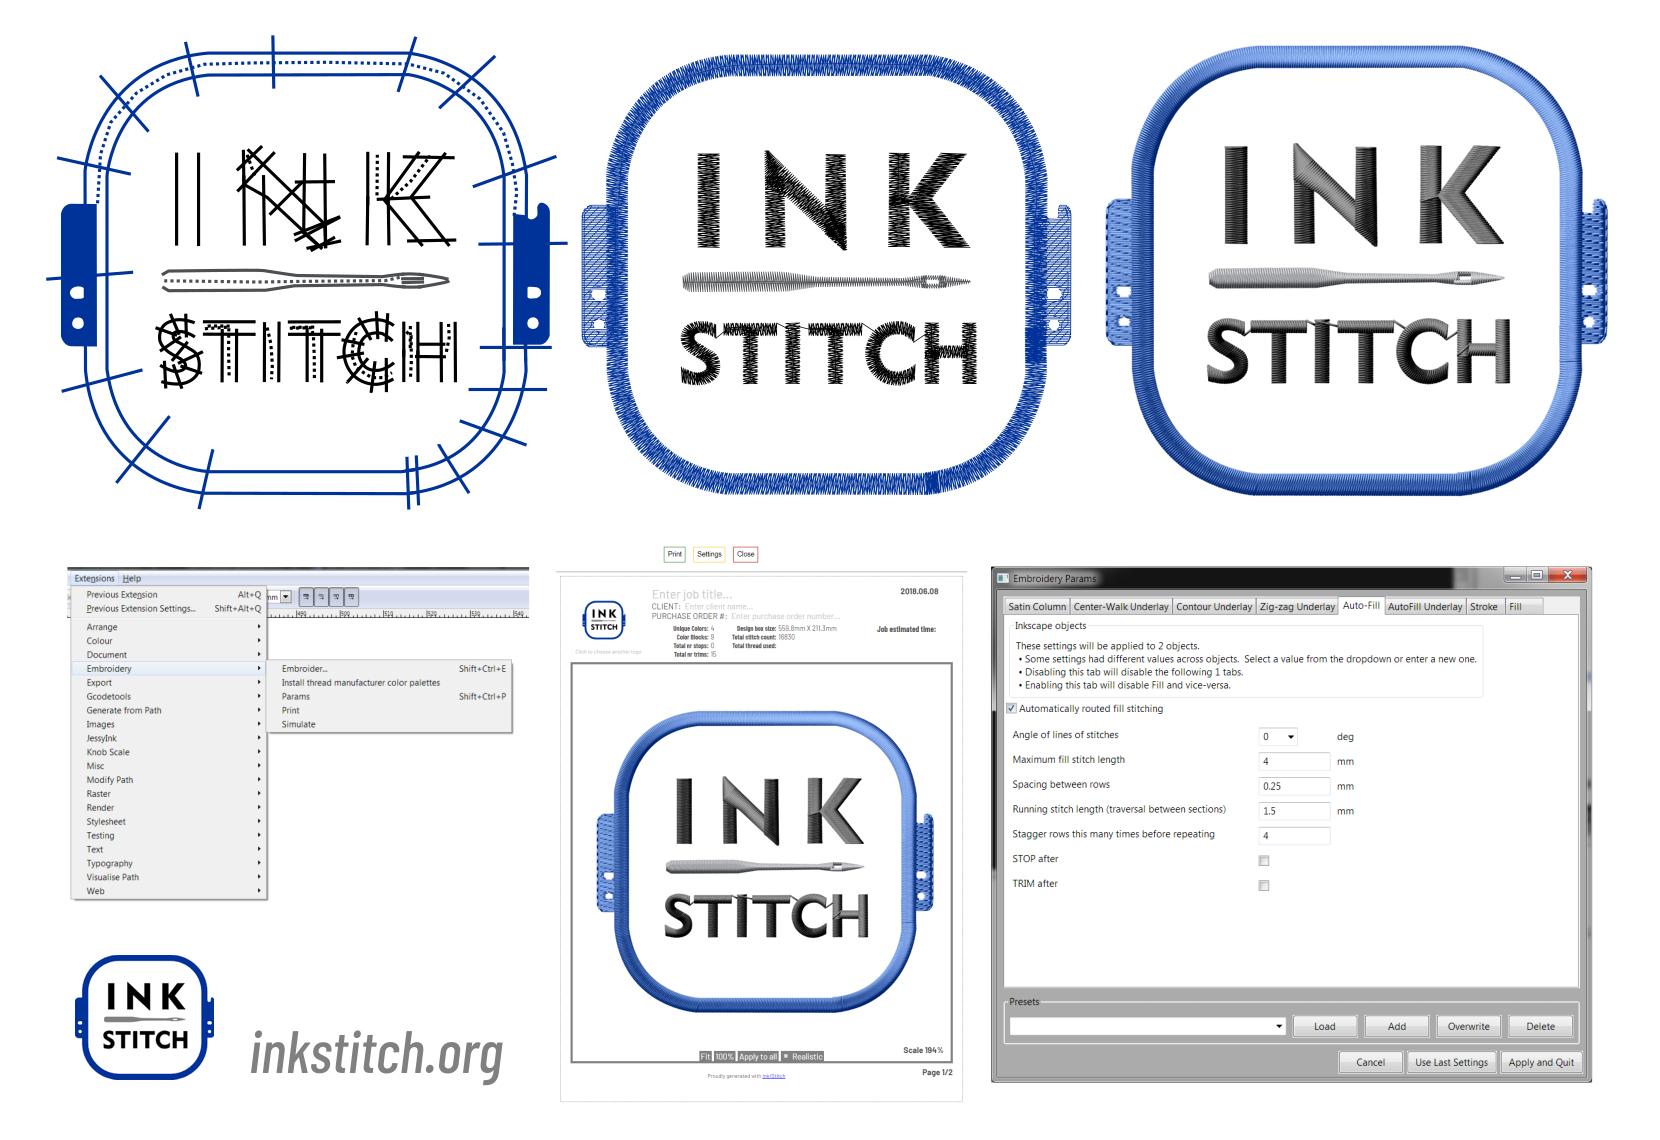 Embroidery Pattern Software Inkstitch Inkstitch